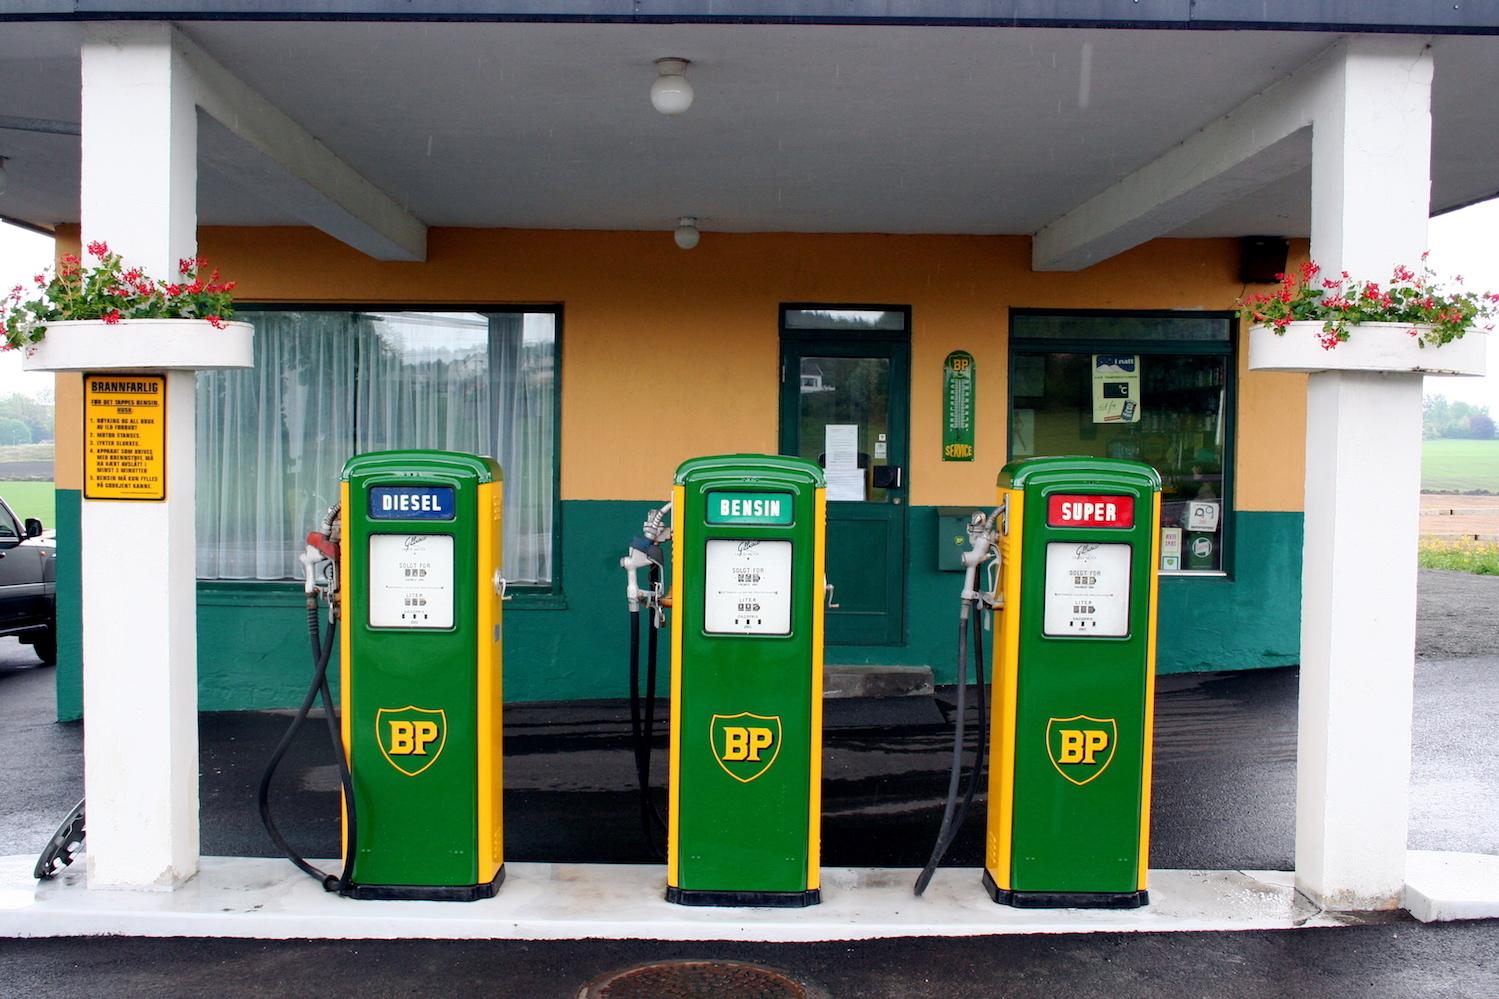 BP gas station in Norway